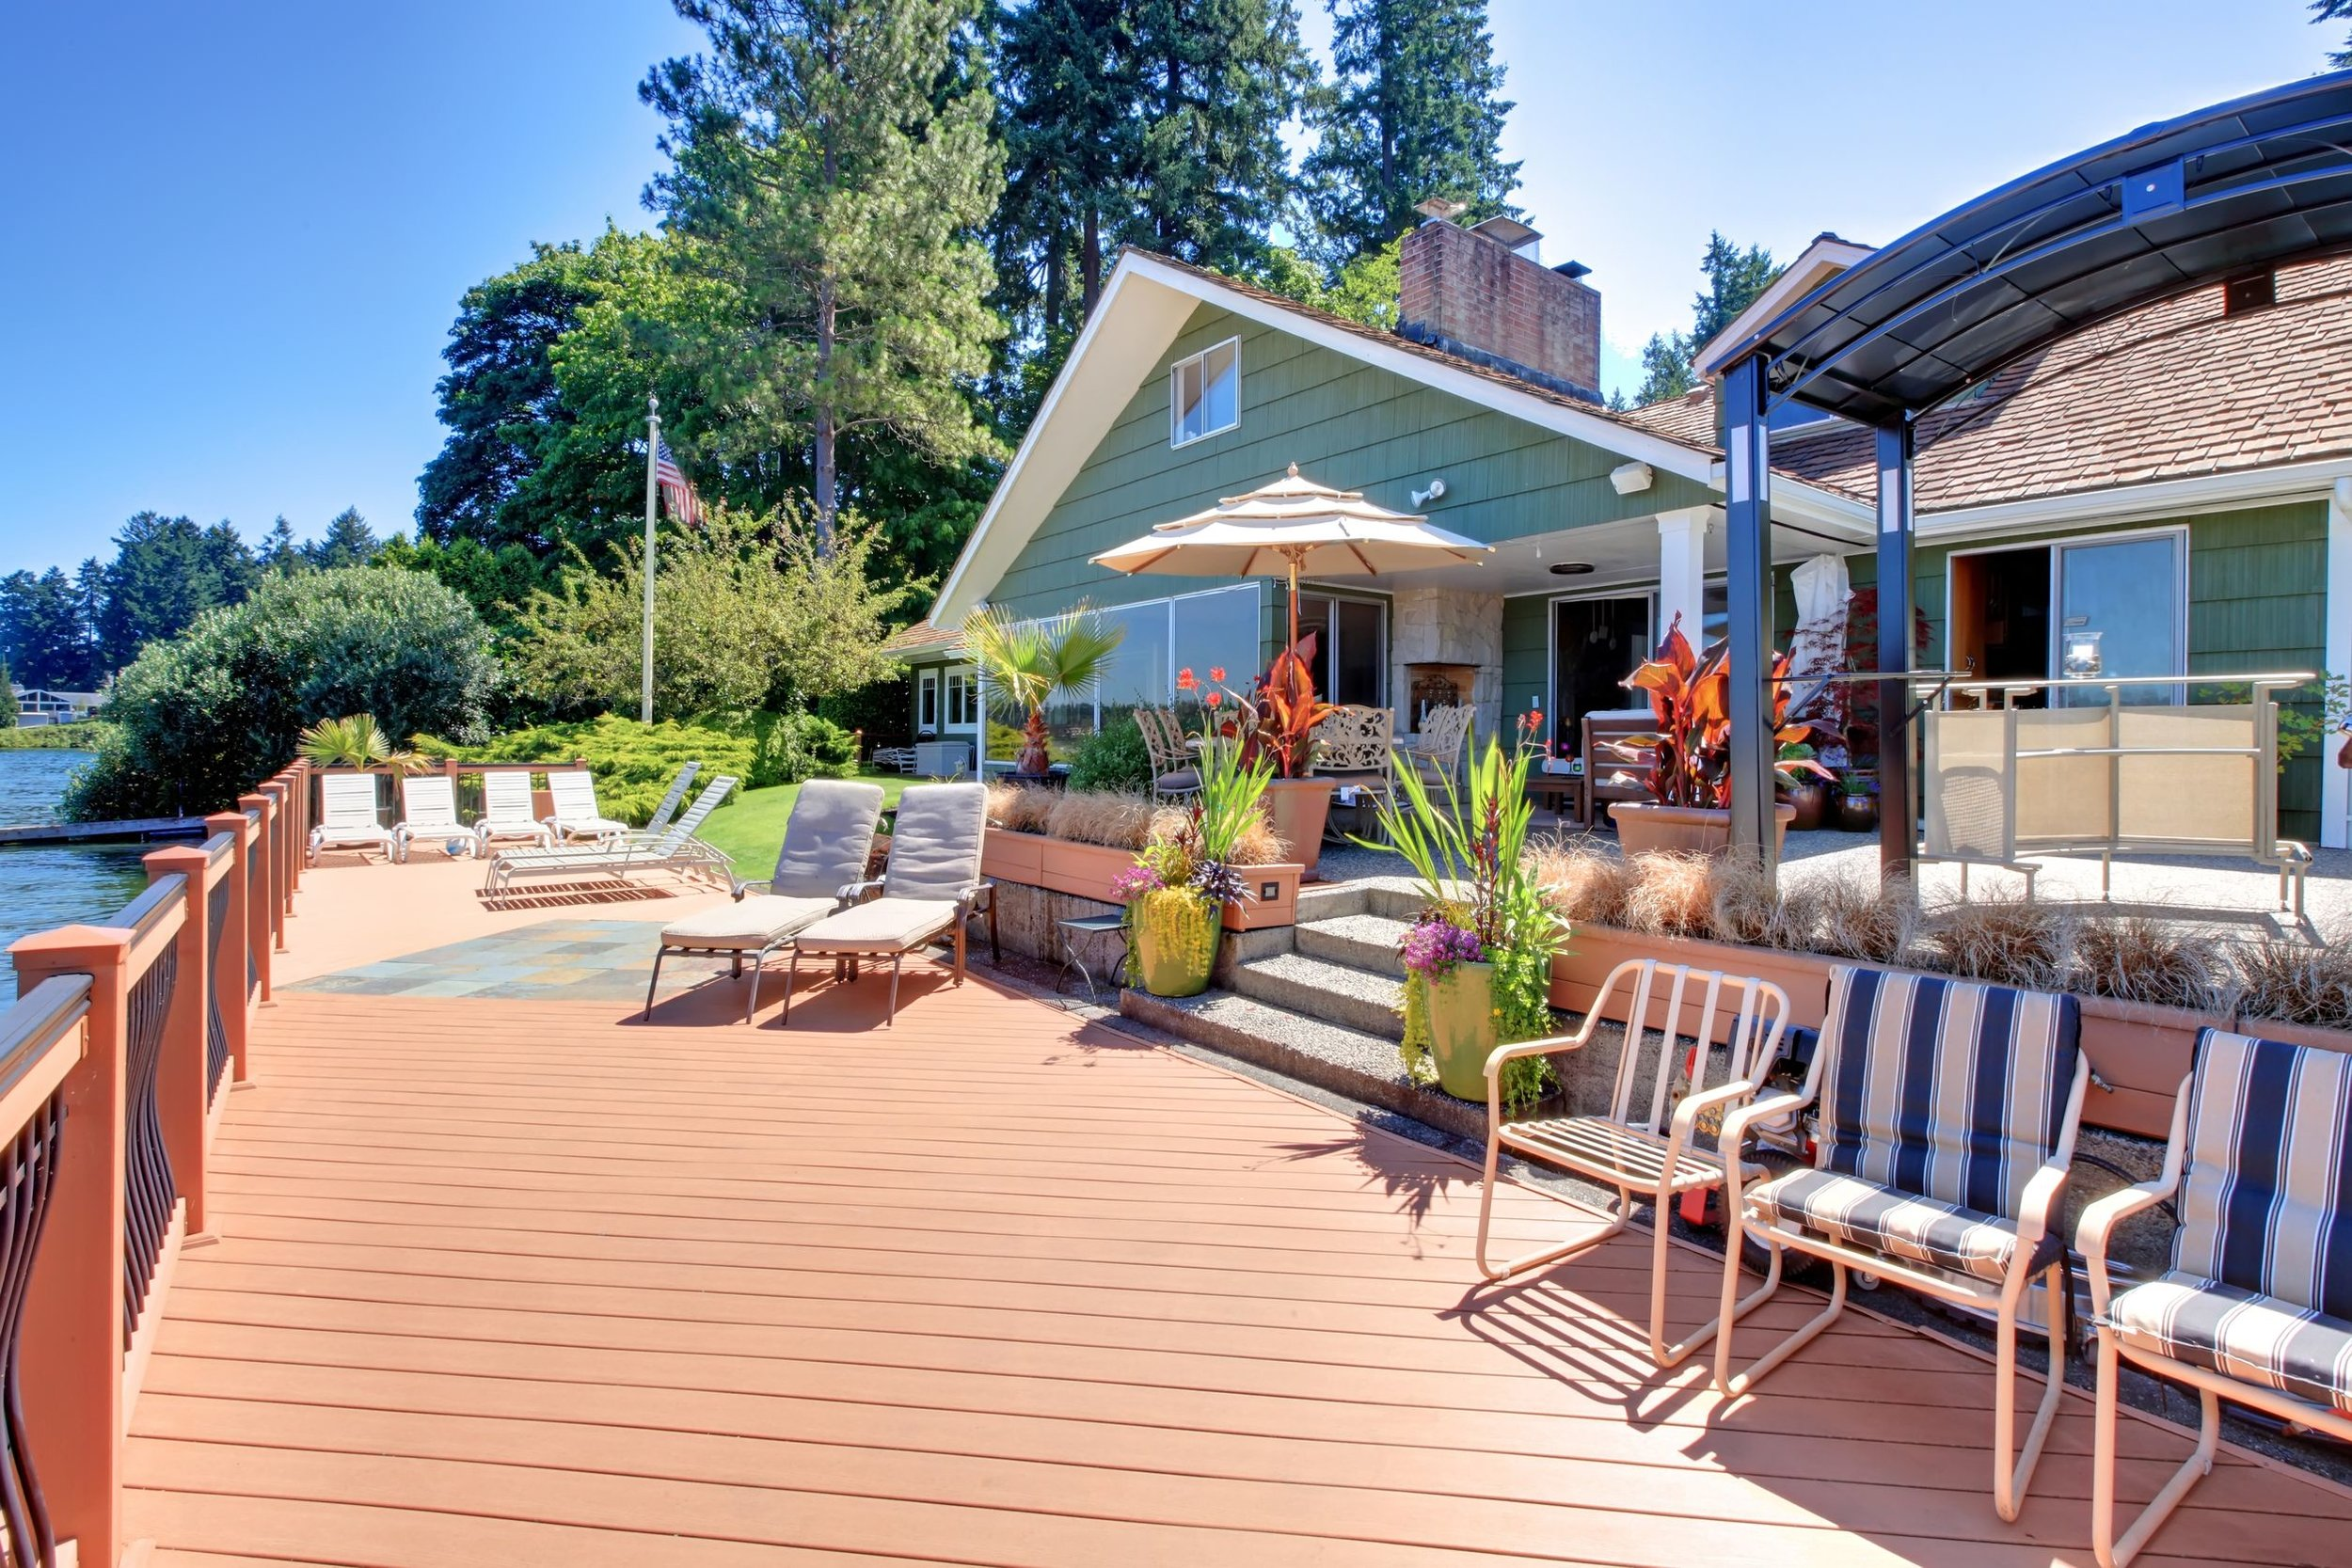 lake_house_patio.jpg